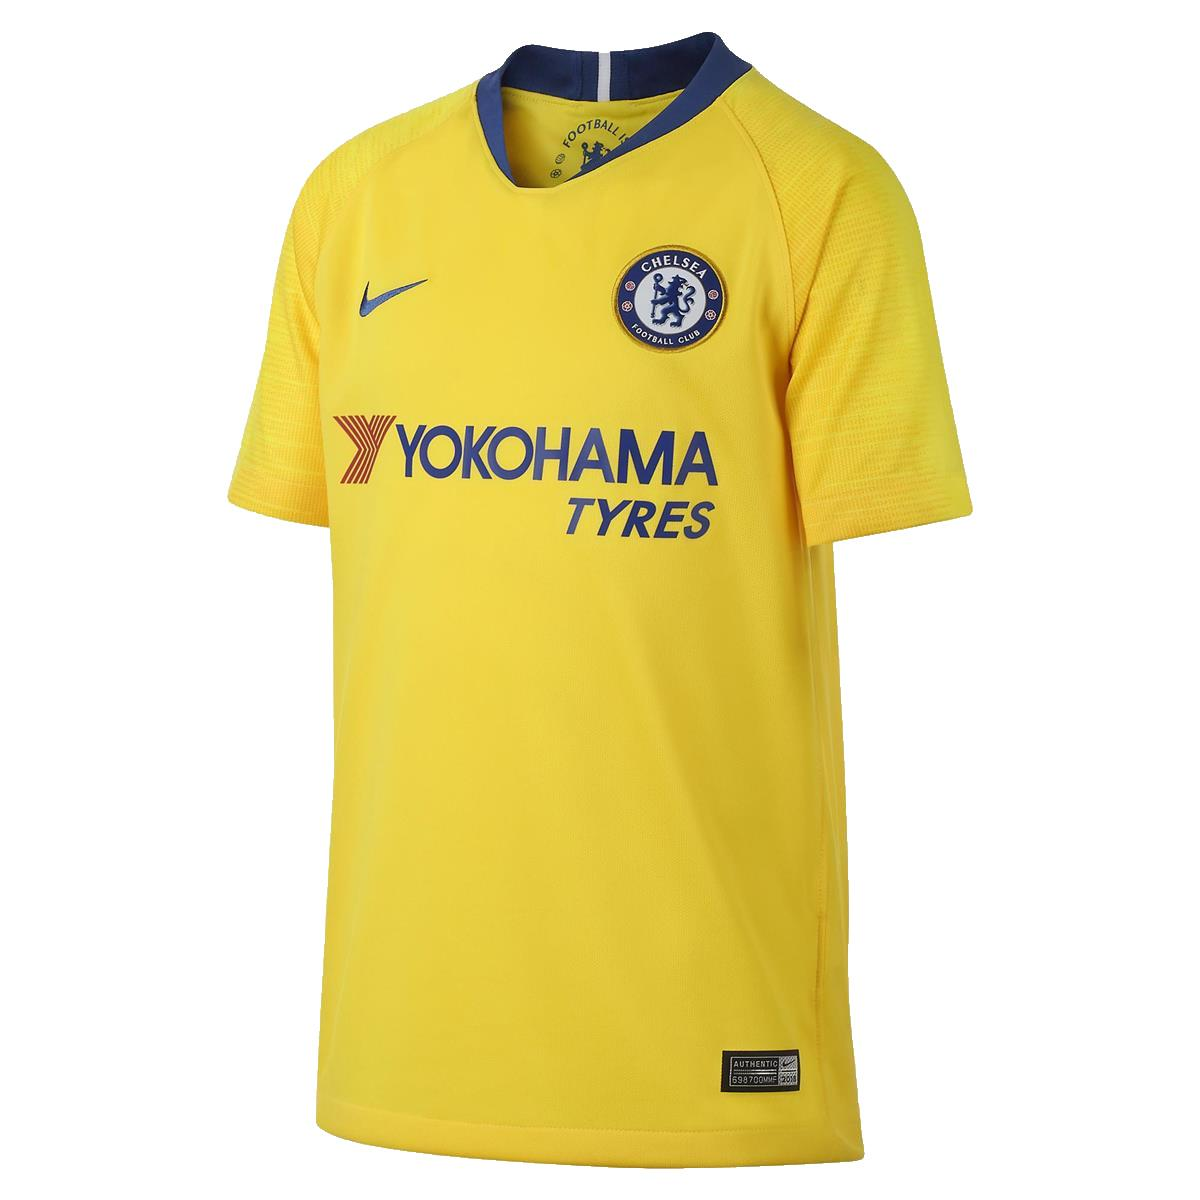 be42081d0 Camisa Nike Chelsea II 2018 2019 Torcedor Infantil